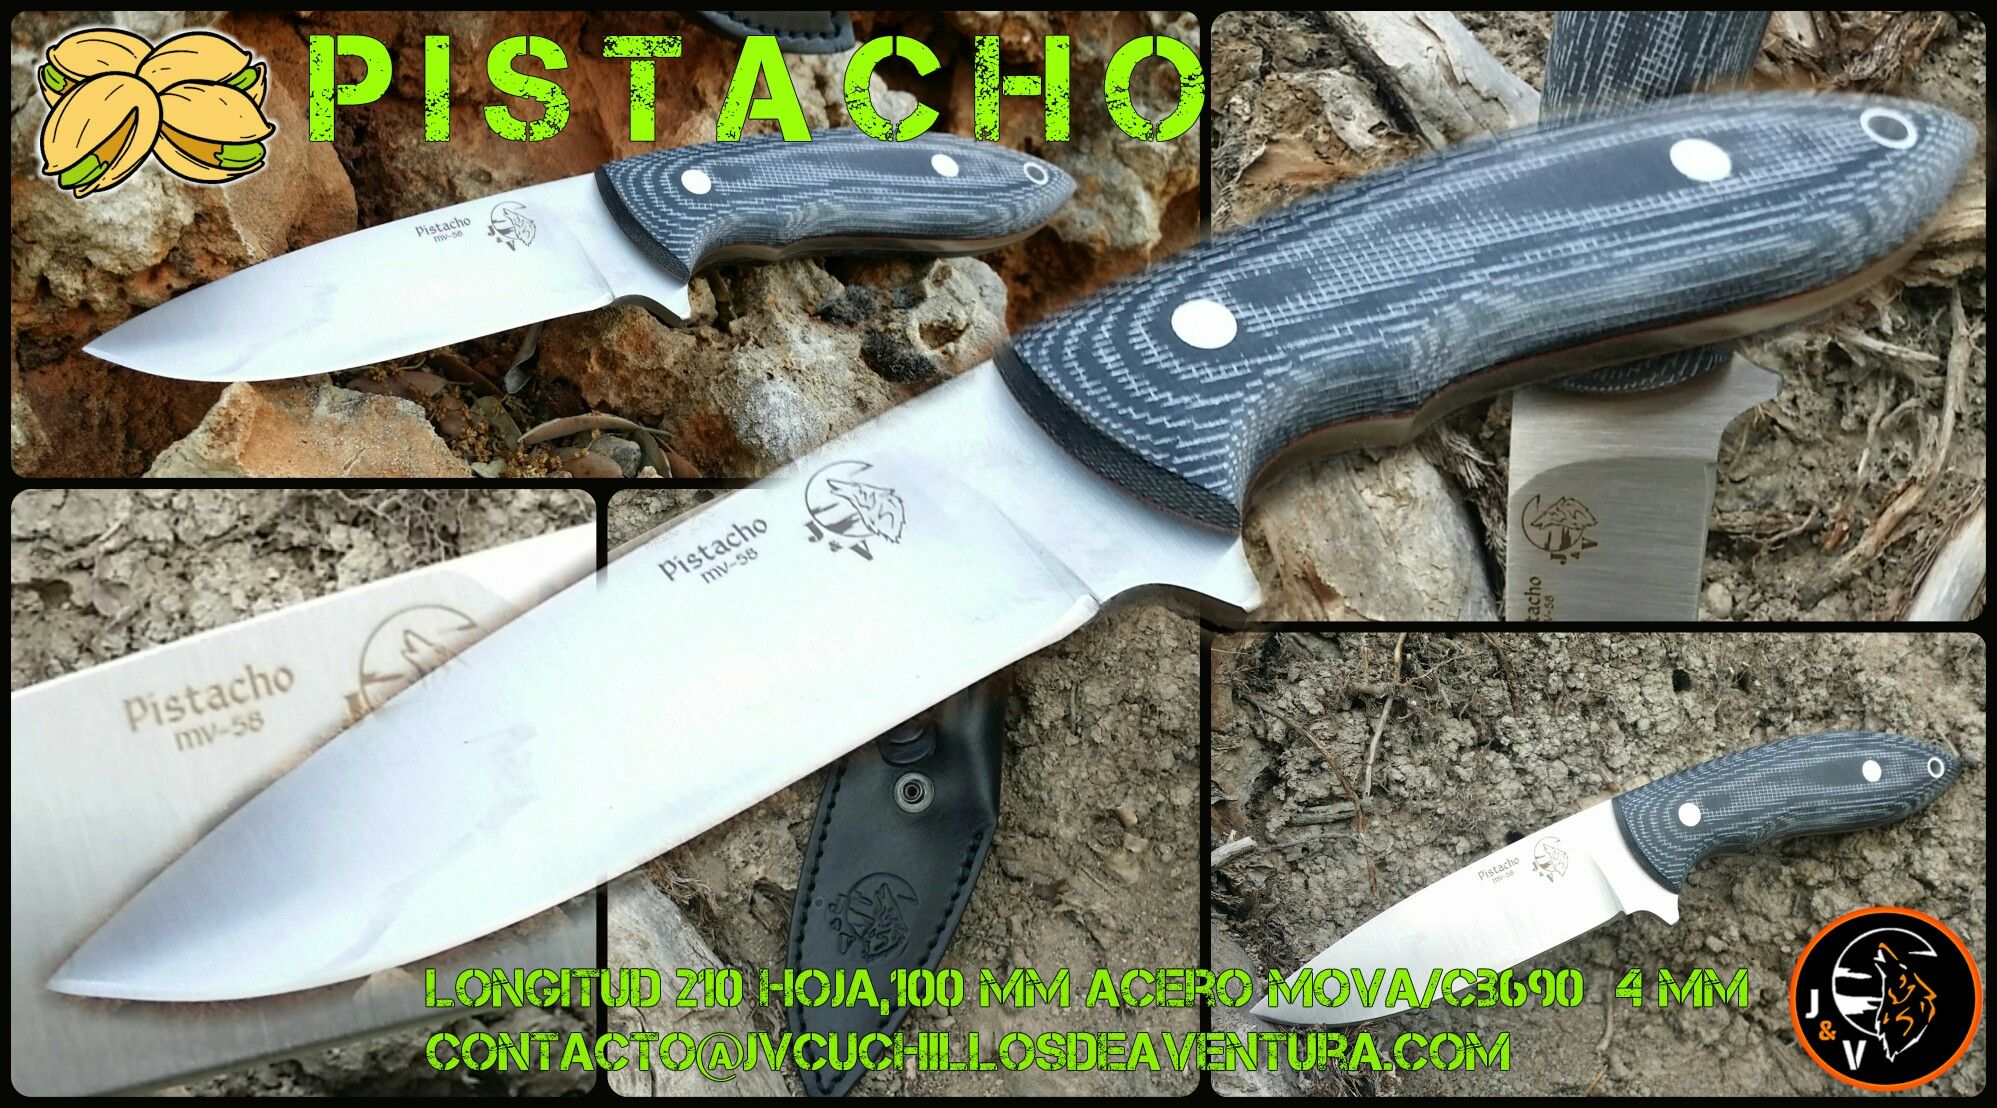 Cuchillo de Pistacho de J&V Cuchillos de Aventura / Pistacho Knife by J&V Adventure Knives.